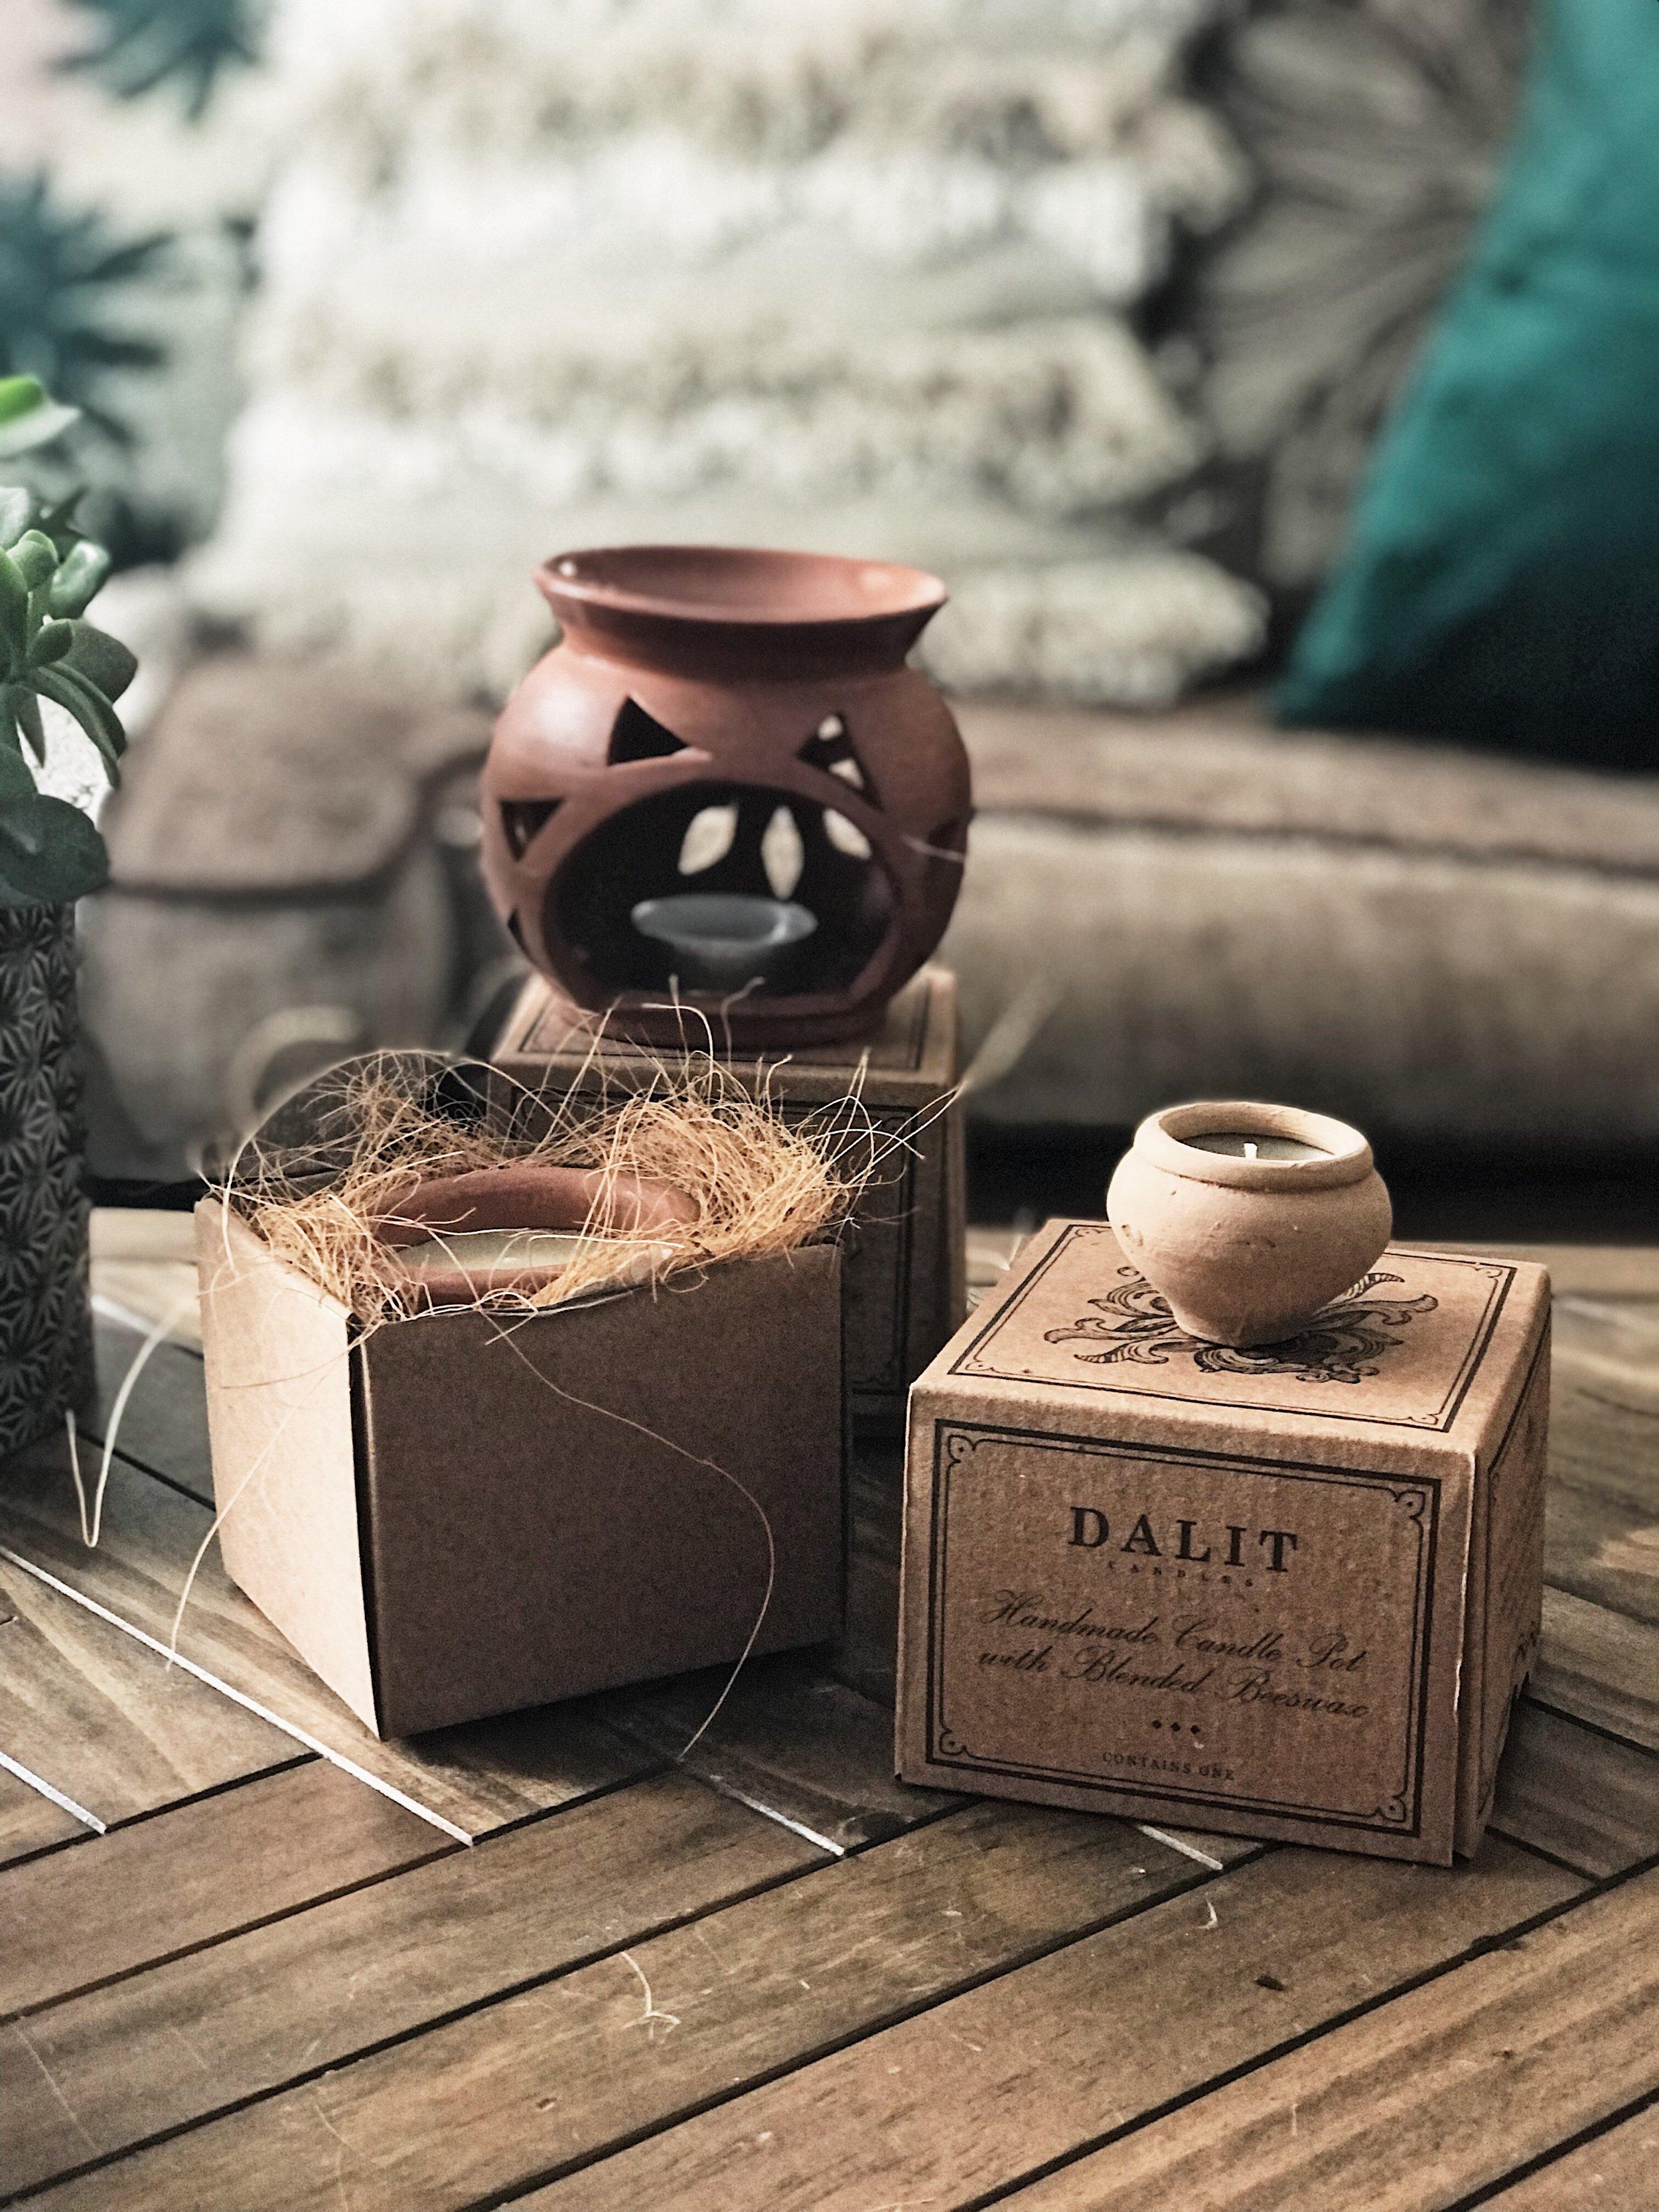 Beautiful rustic packaging